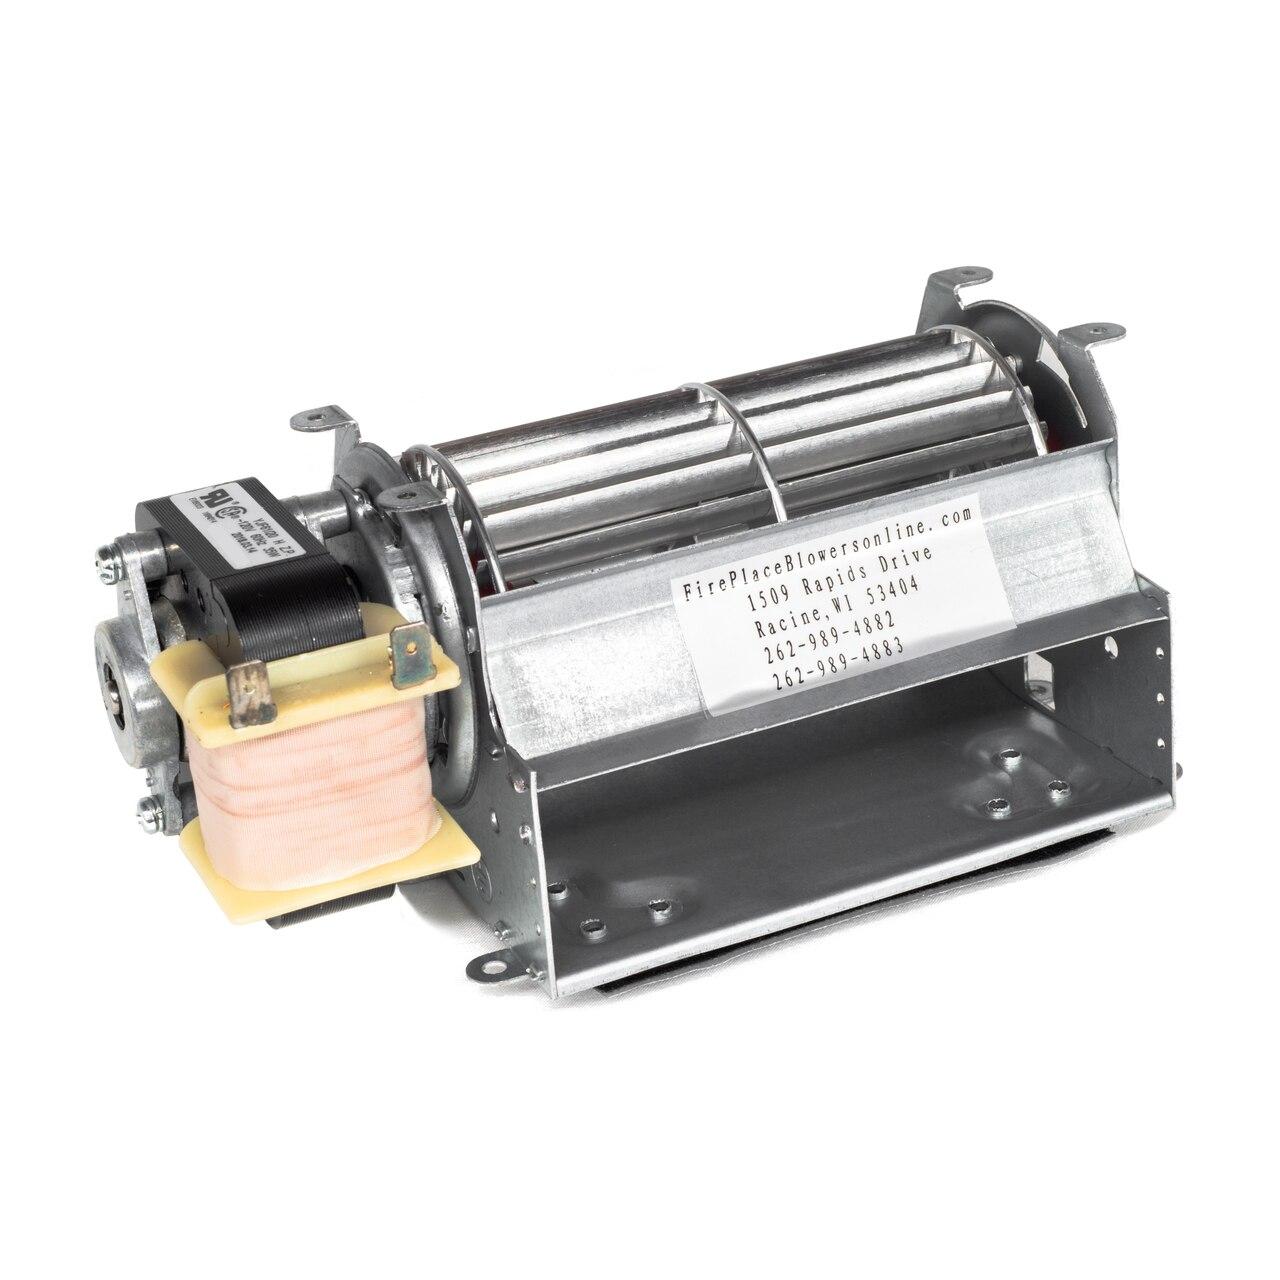 GFK21, FK21, UZY3 Fireplace Blower for Heatilator, Security | R7-RB66